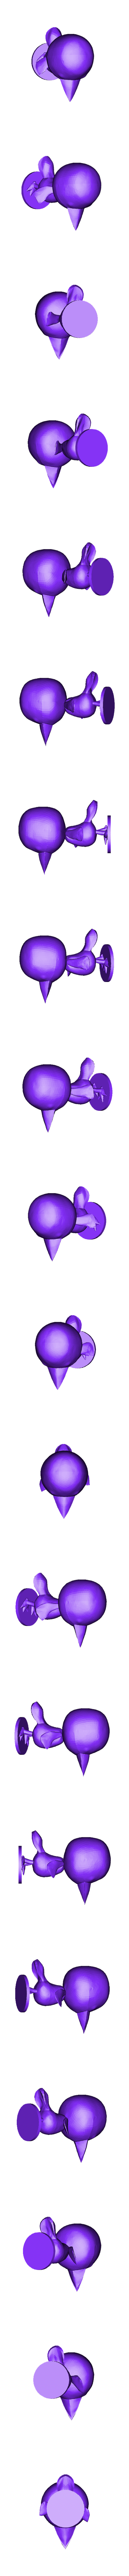 jay_full.stl Download free STL file Jay - Animal Crossing • 3D printing design, skelei